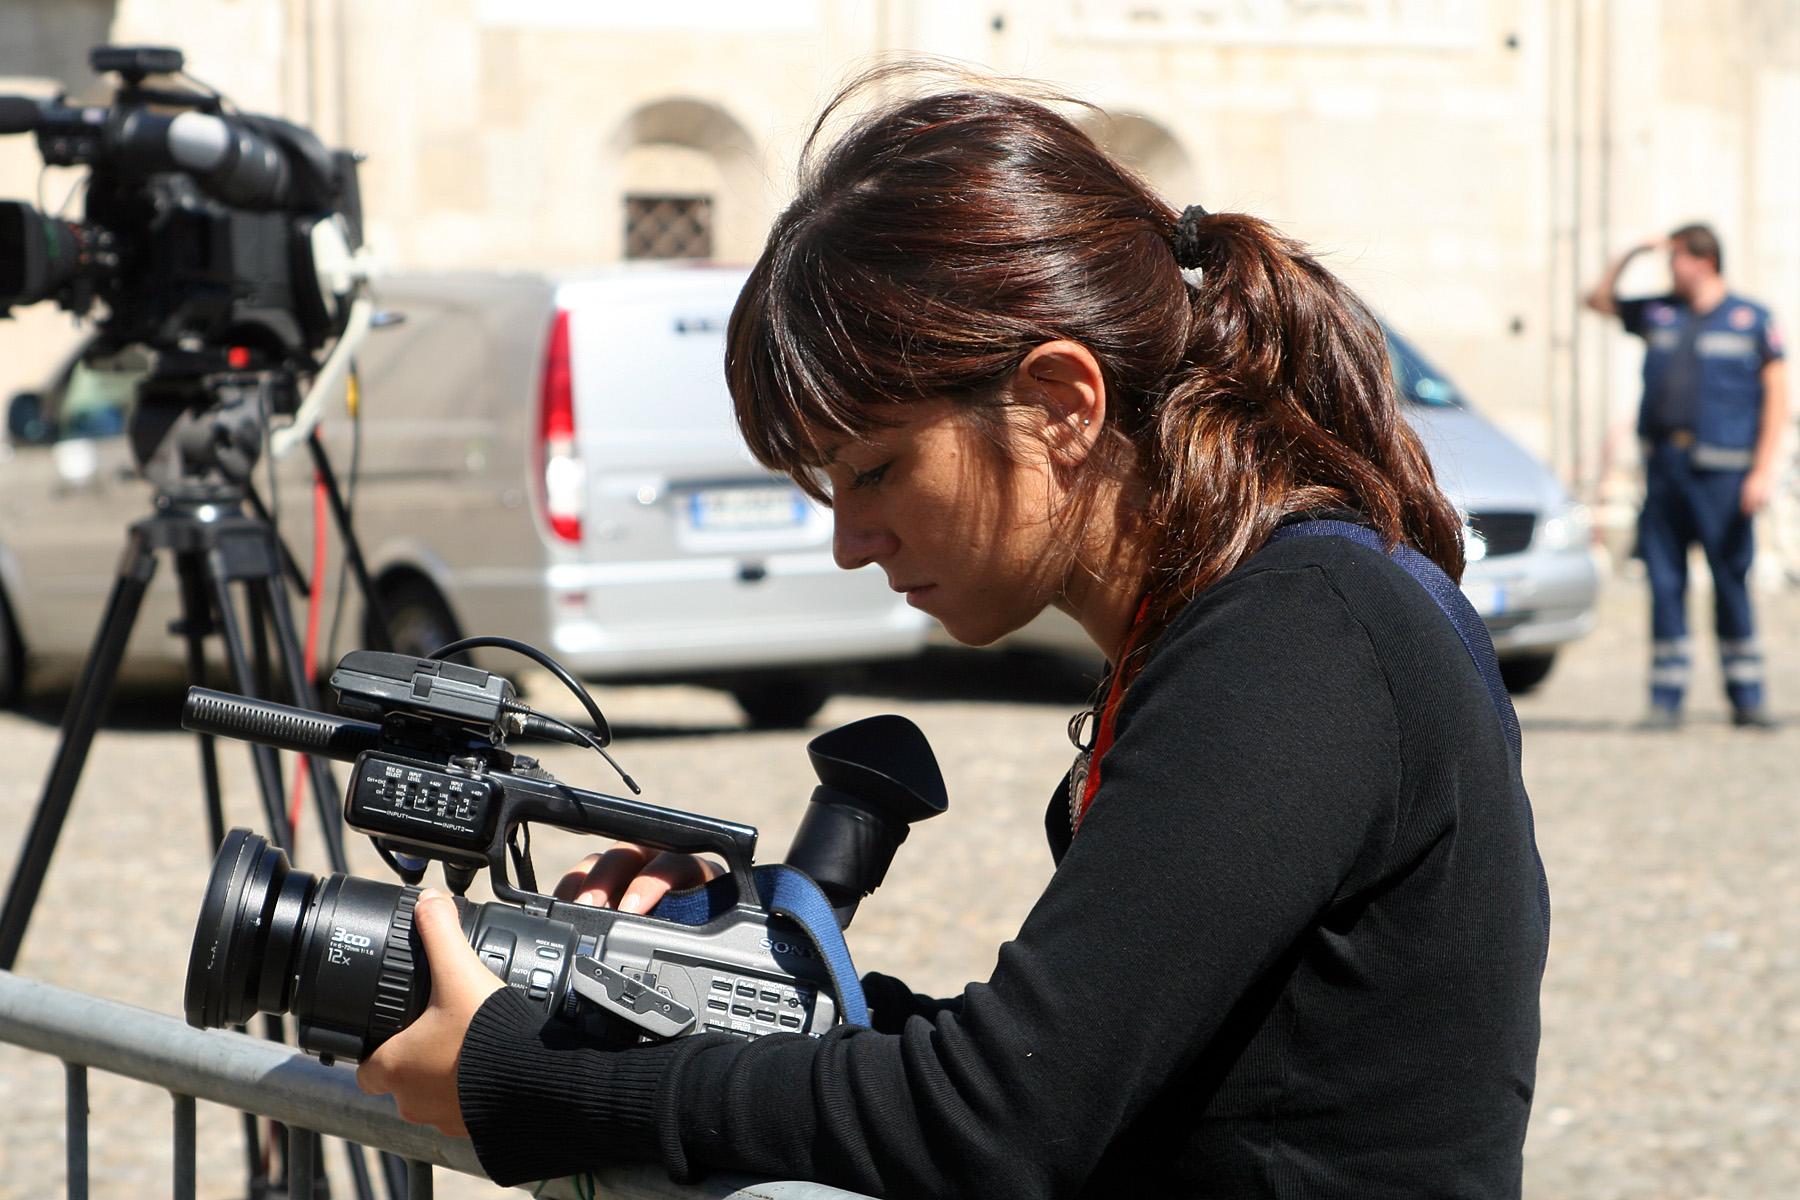 Videojournalist Wikimedia